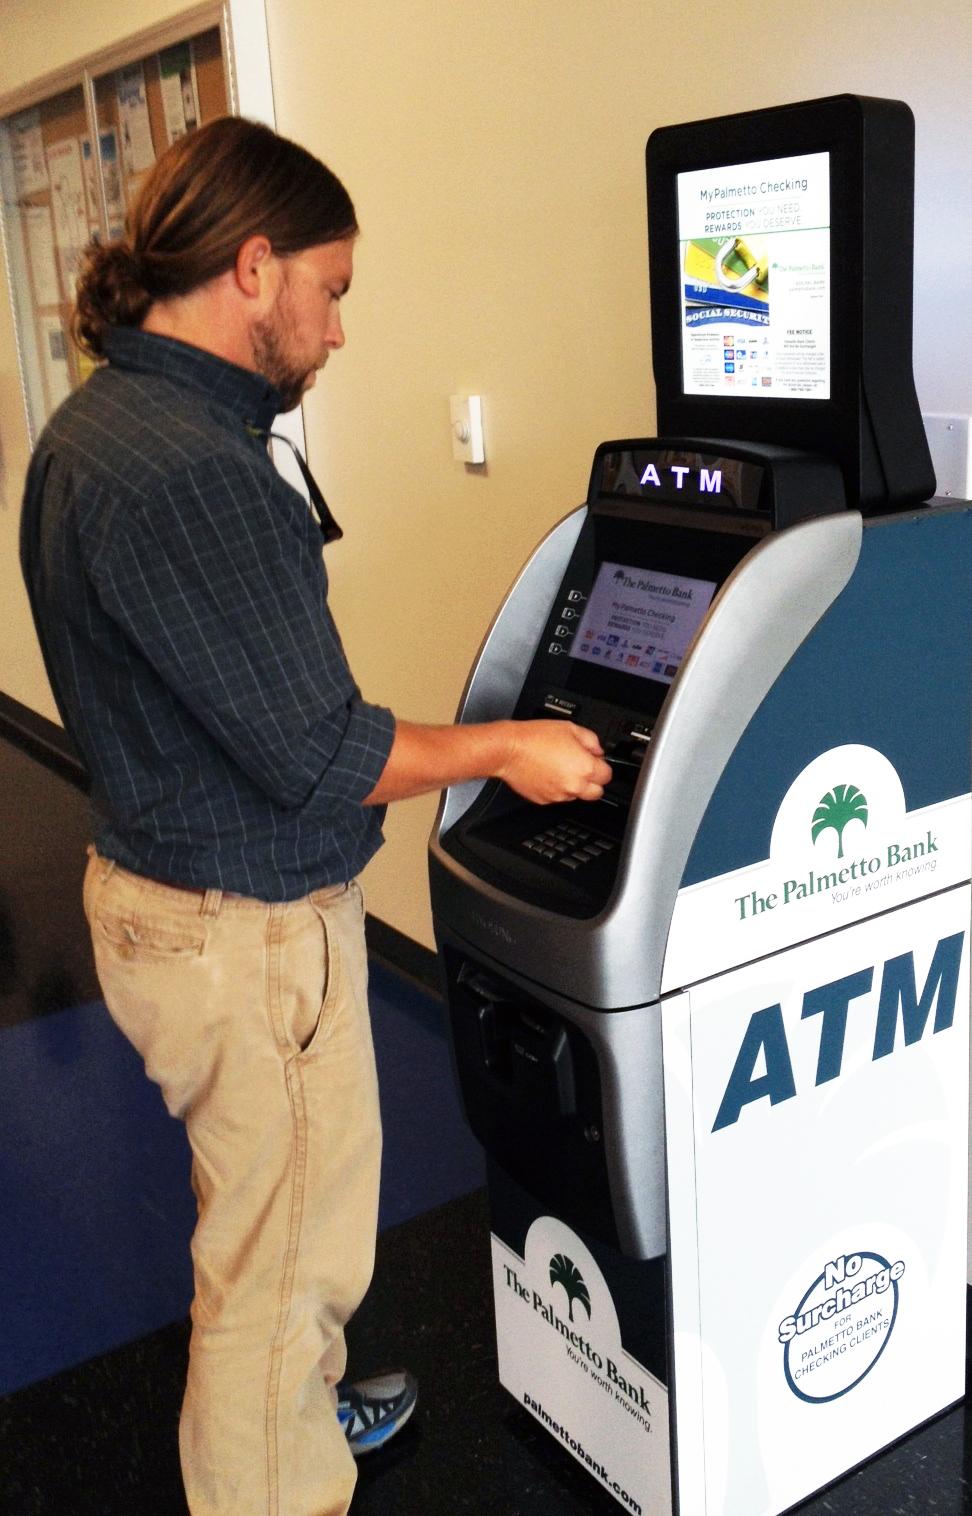 Credit Union Bank at Work Programs